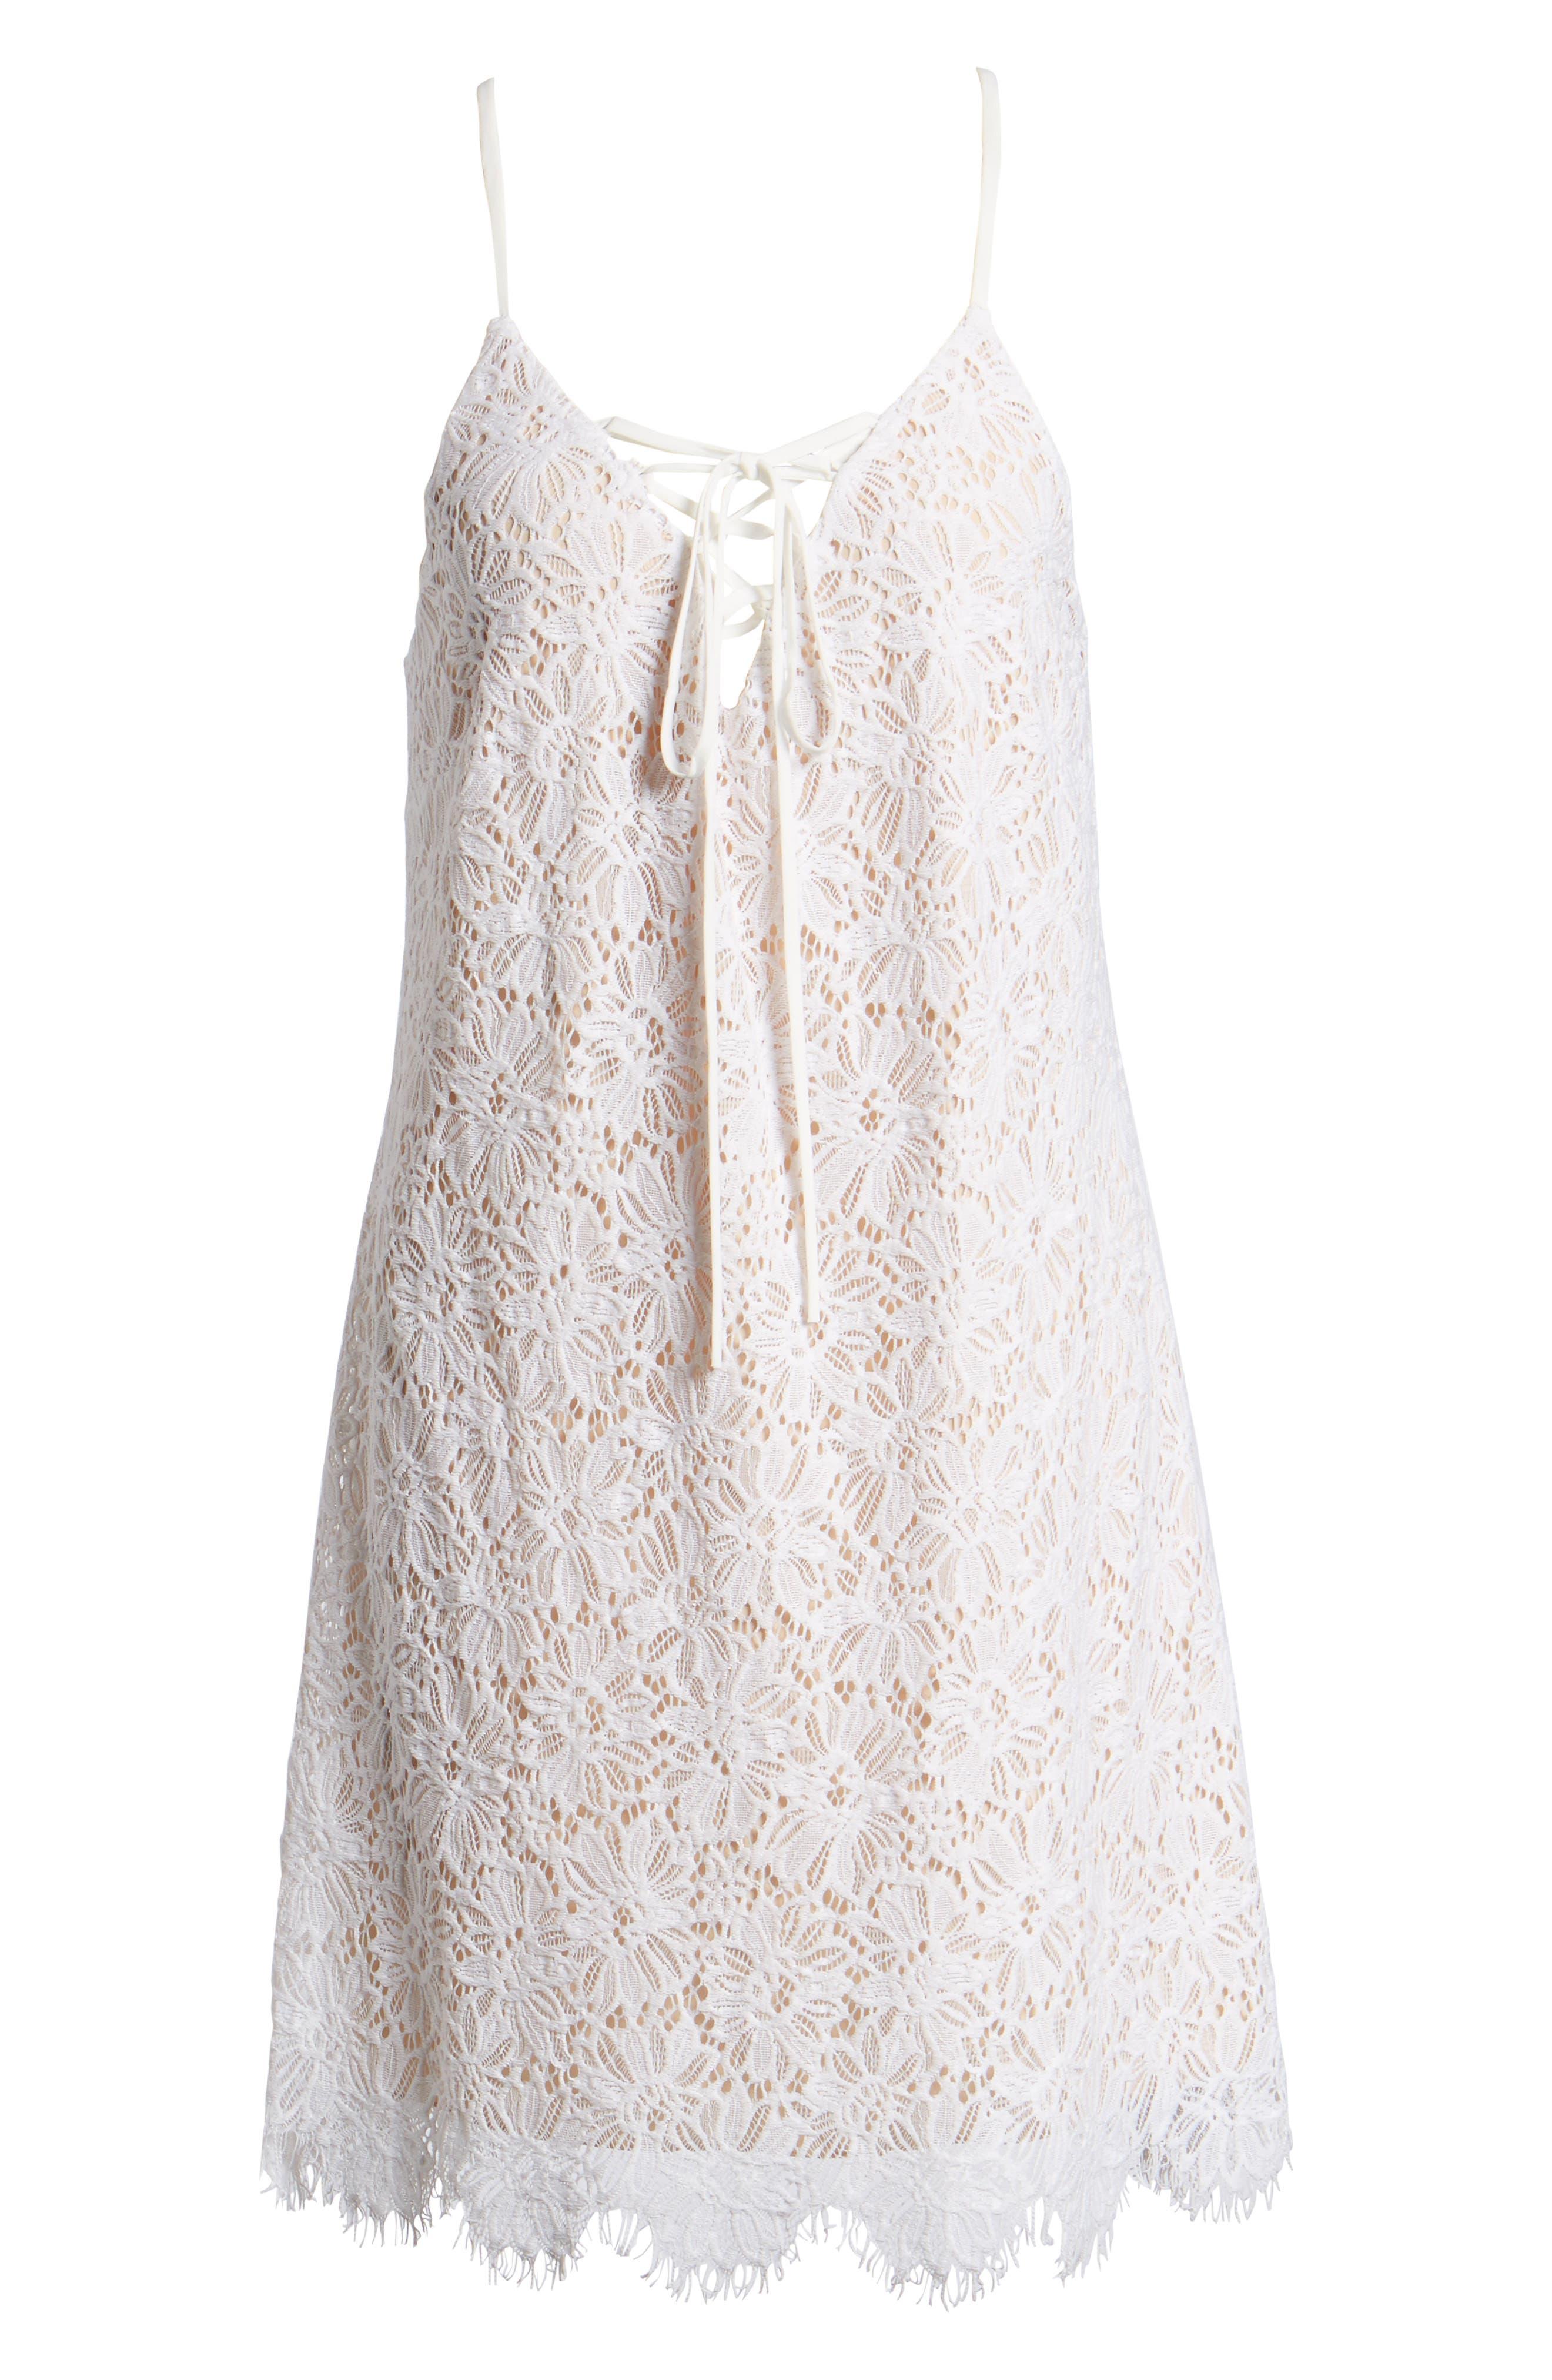 Lace-Up Lace Minidress,                             Alternate thumbnail 6, color,                             900